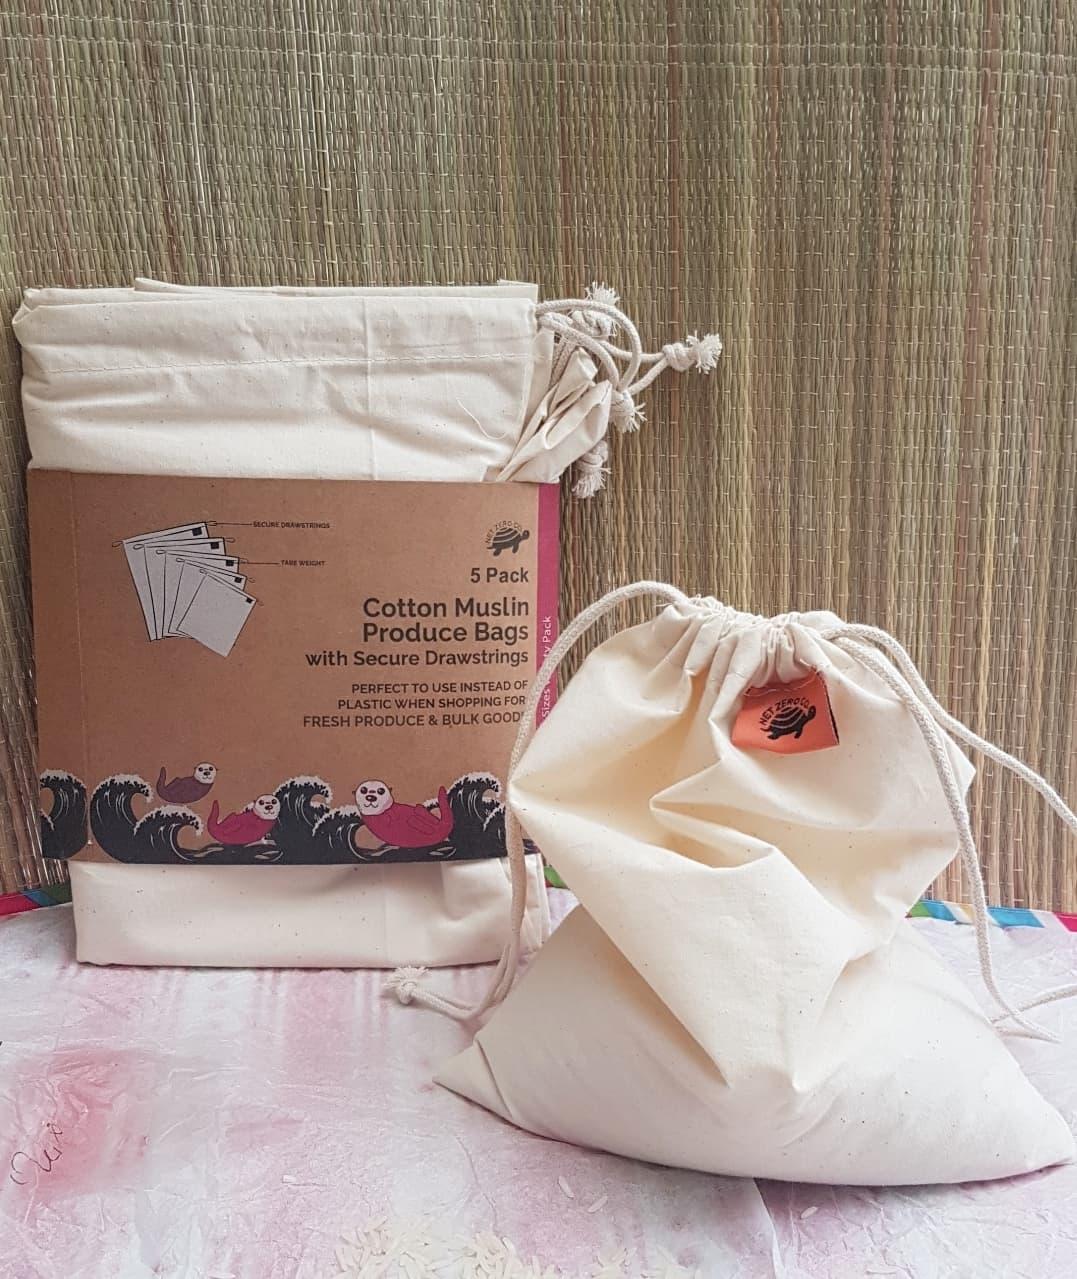 Net Zero Co Review - Zero Waste Reusable Cotton Produce Bags